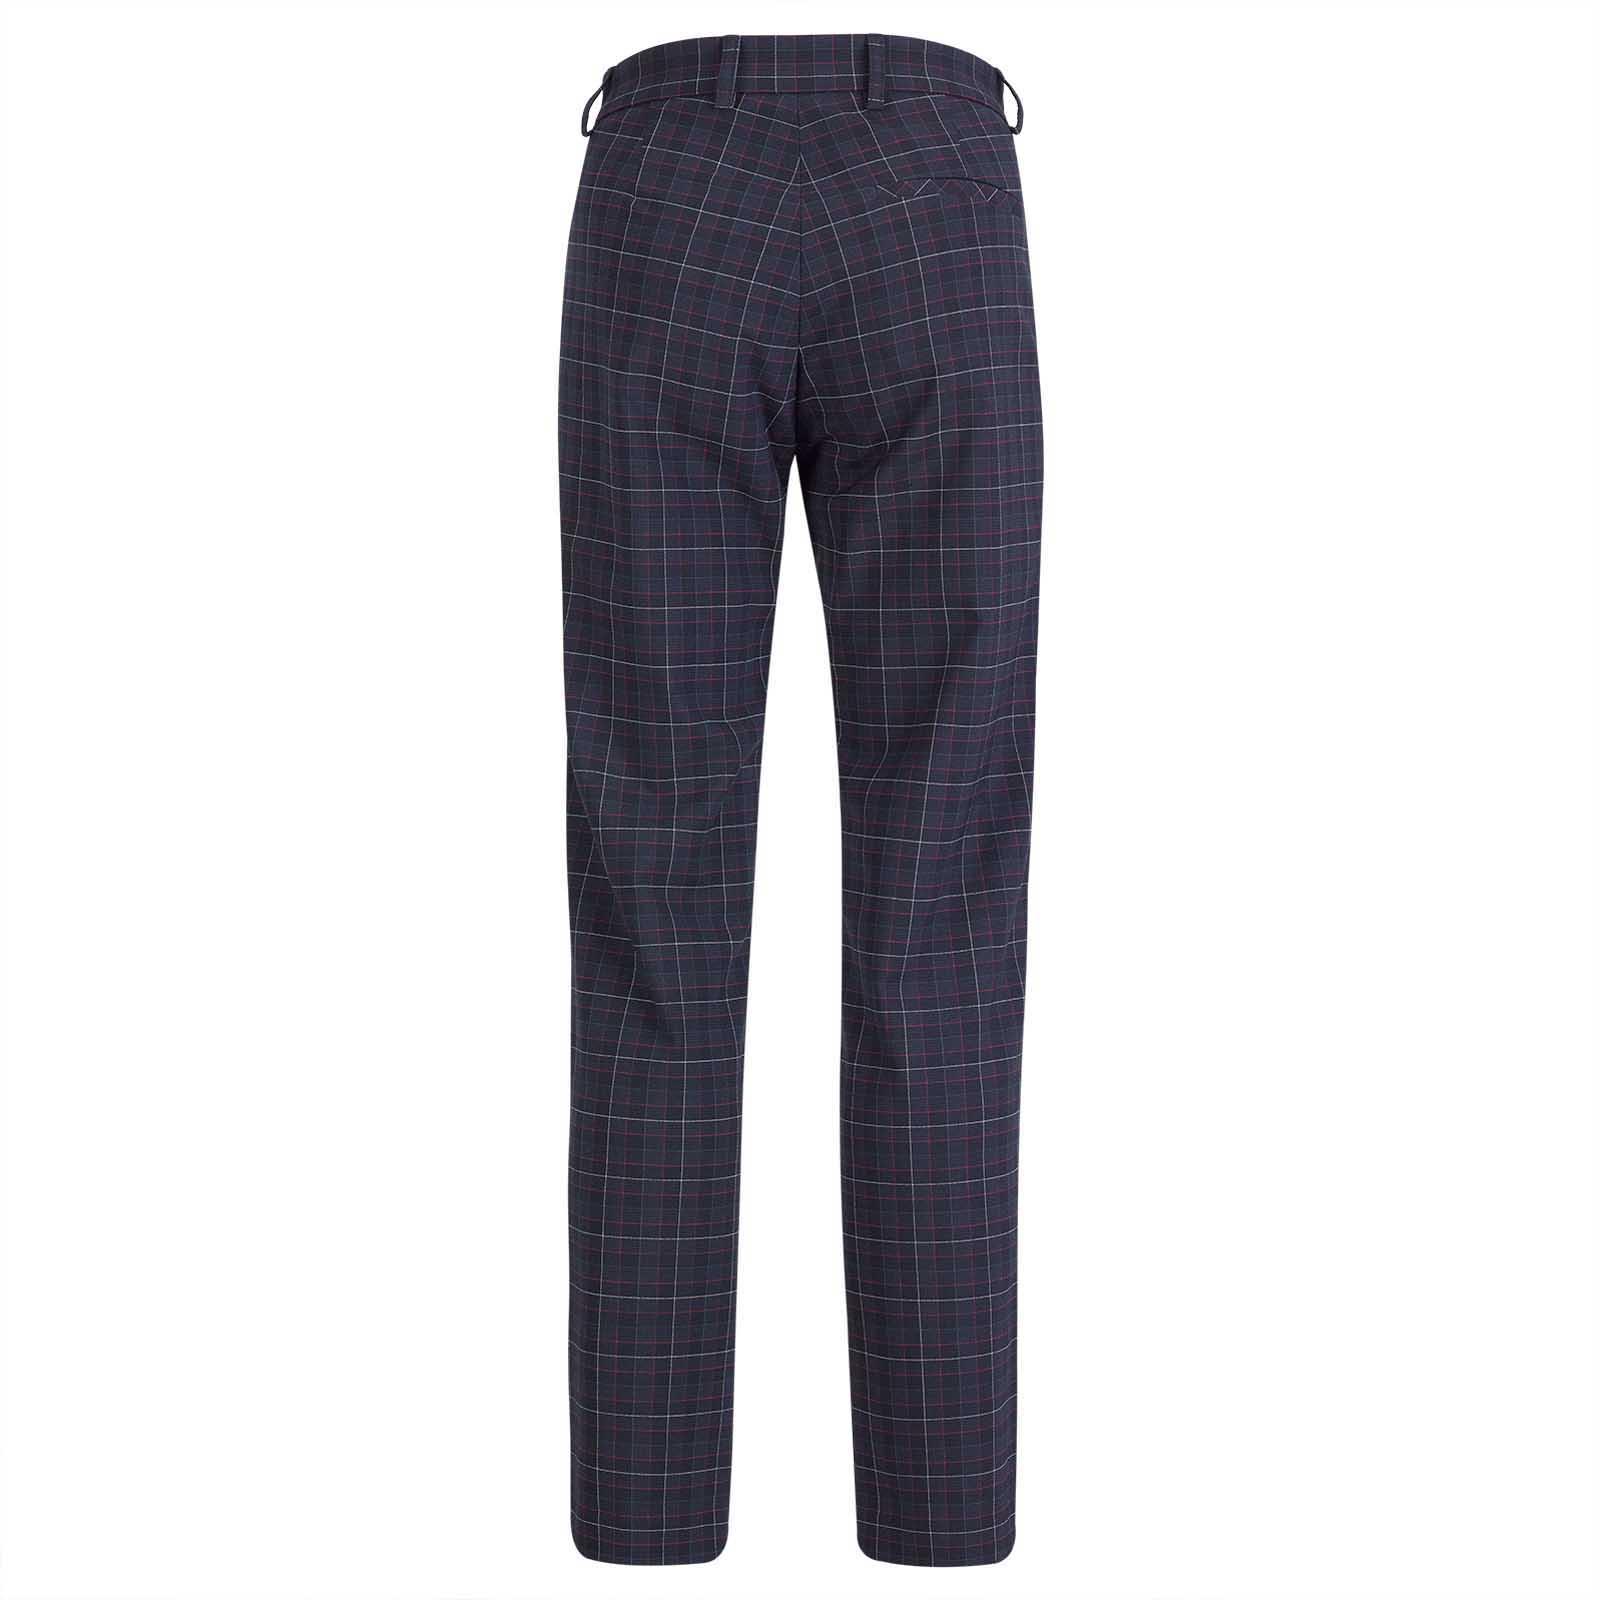 Damen Karo-Golfhose in 7/8 Länge aus softem Stretchmaterial